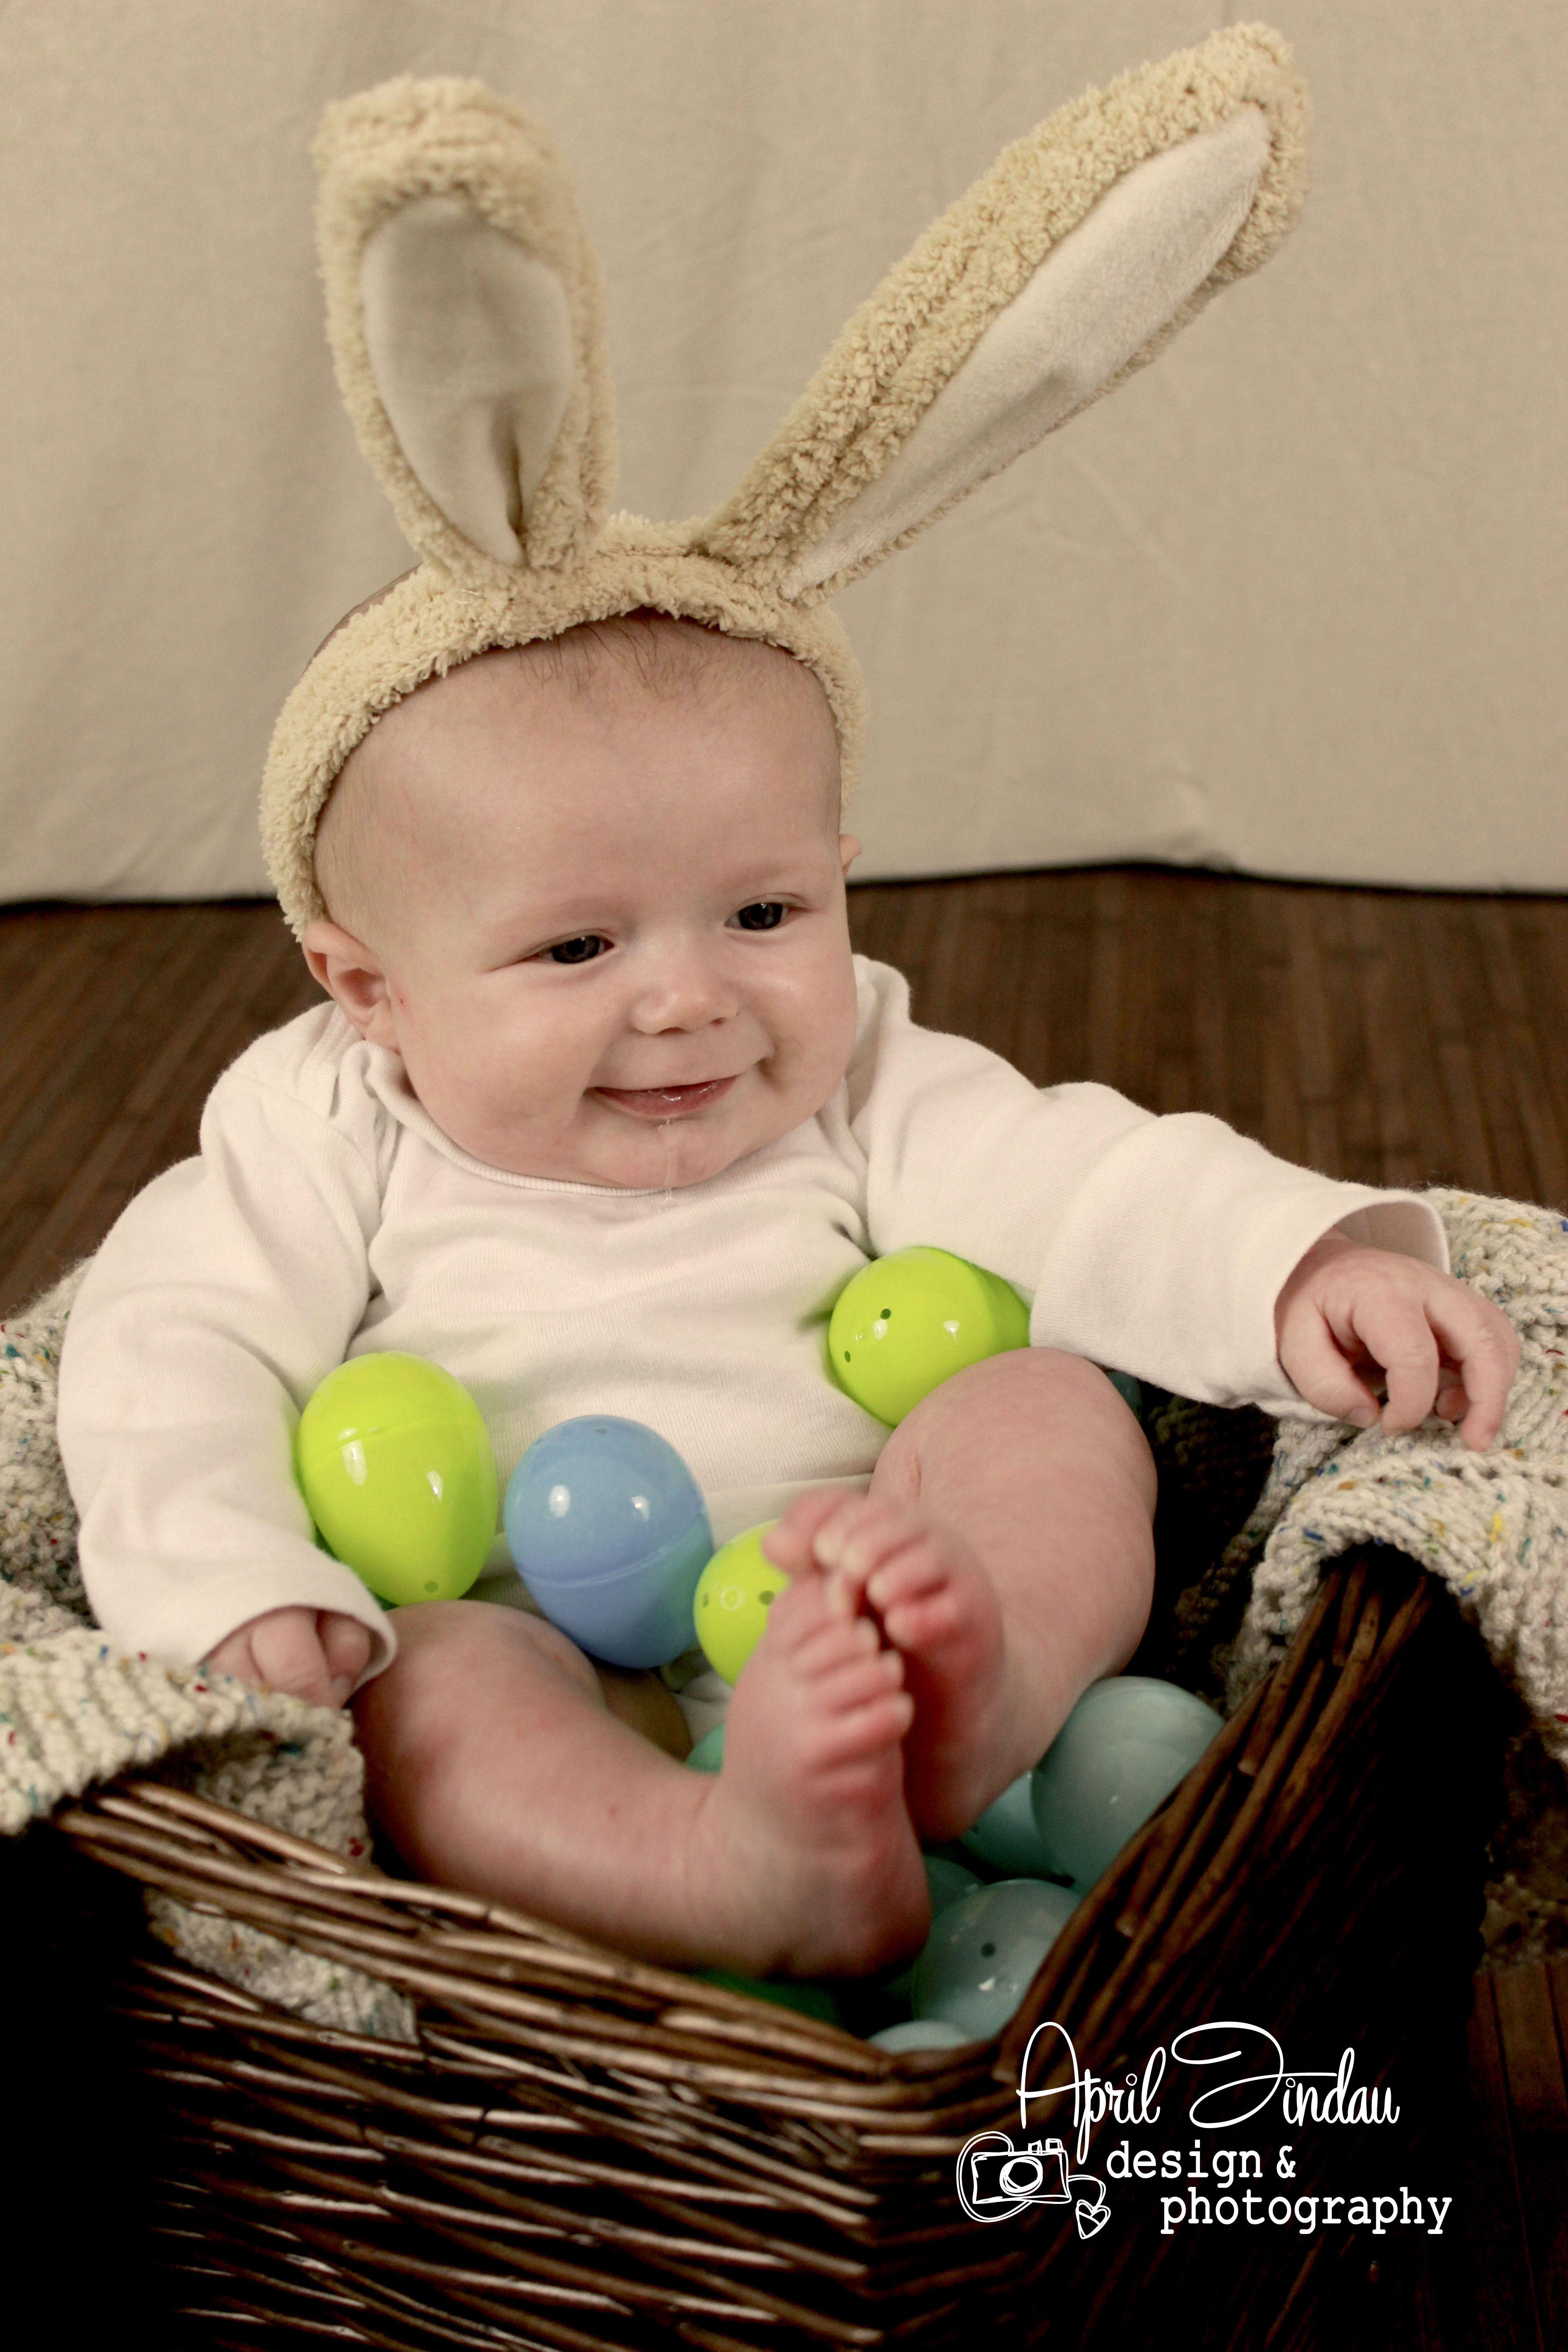 Easter baby boy portrait baby boy boston pinterest baby boy easter baby boy portrait negle Choice Image